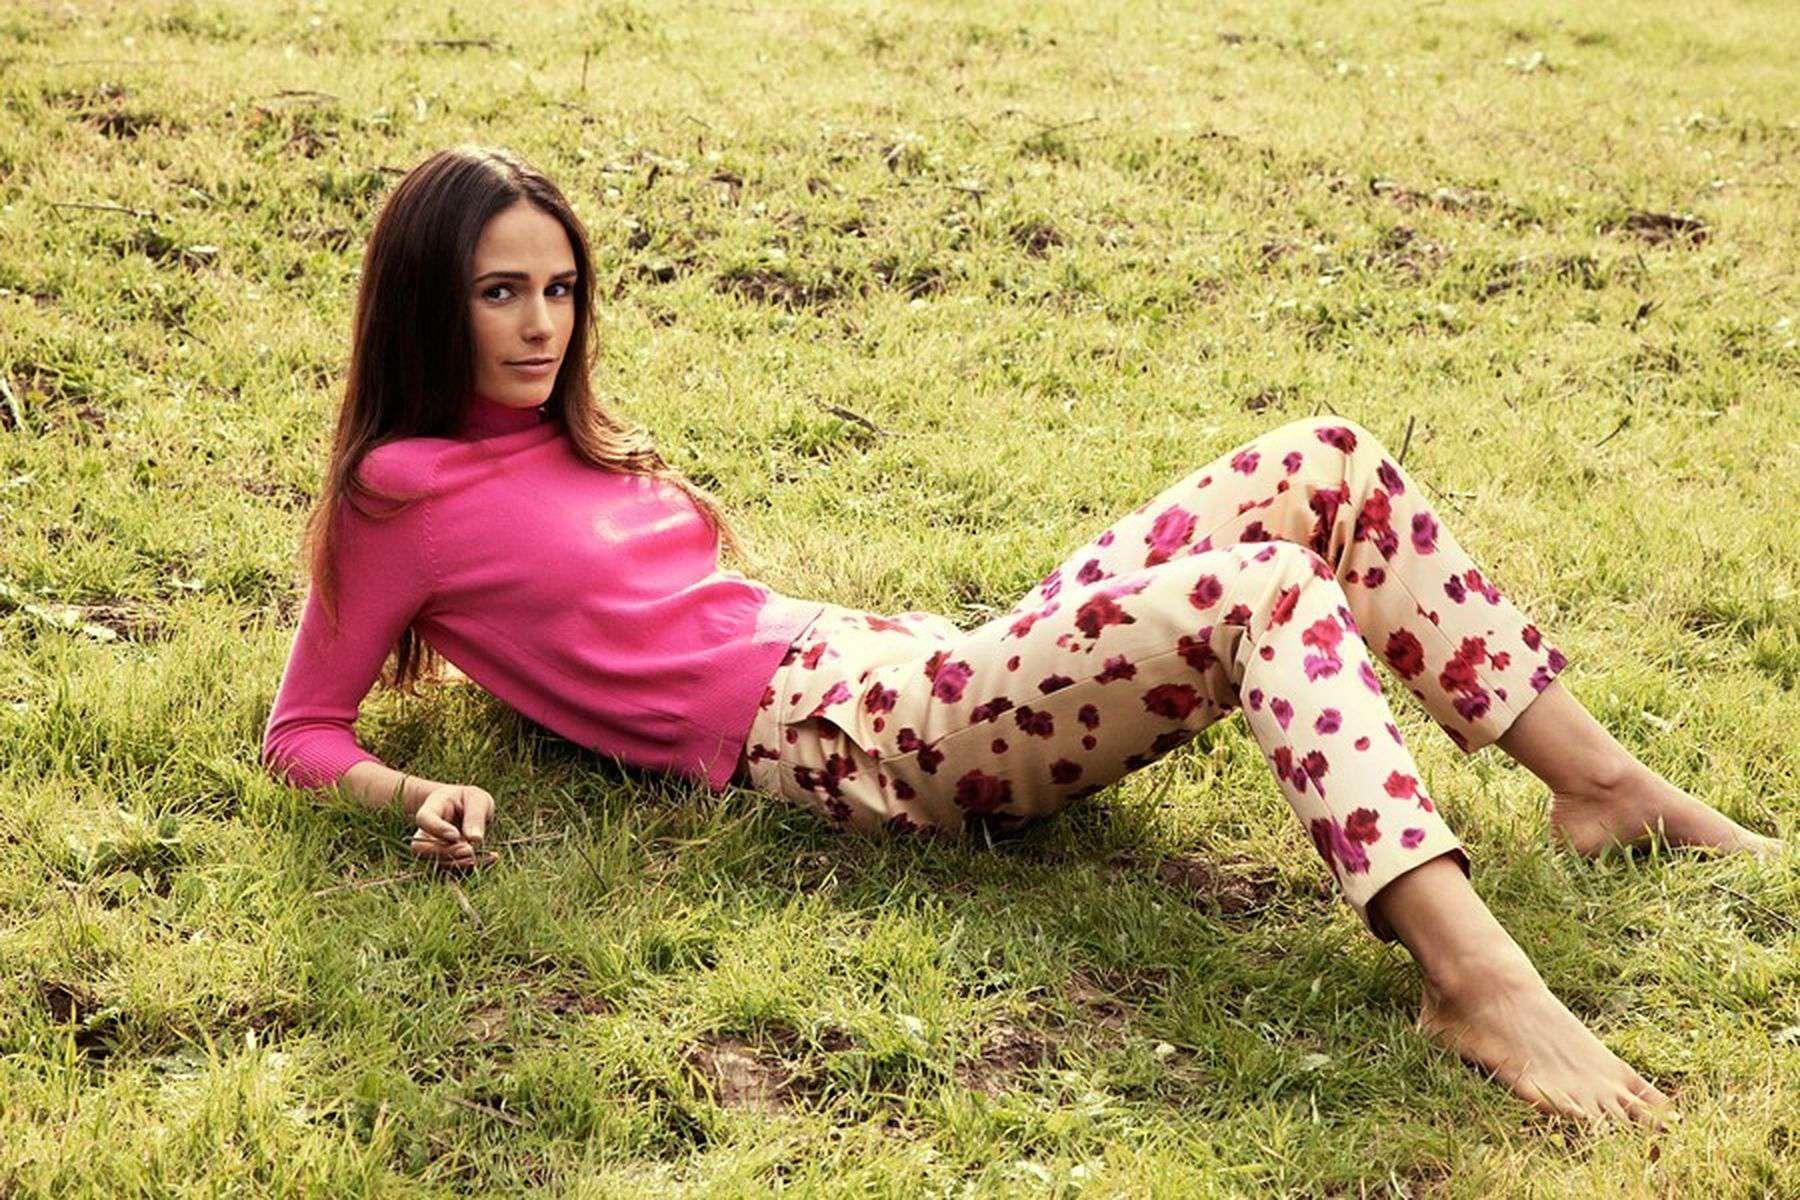 https://pics.wikifeet.com/Jordana-Brewster-Feet-1614411.jpg